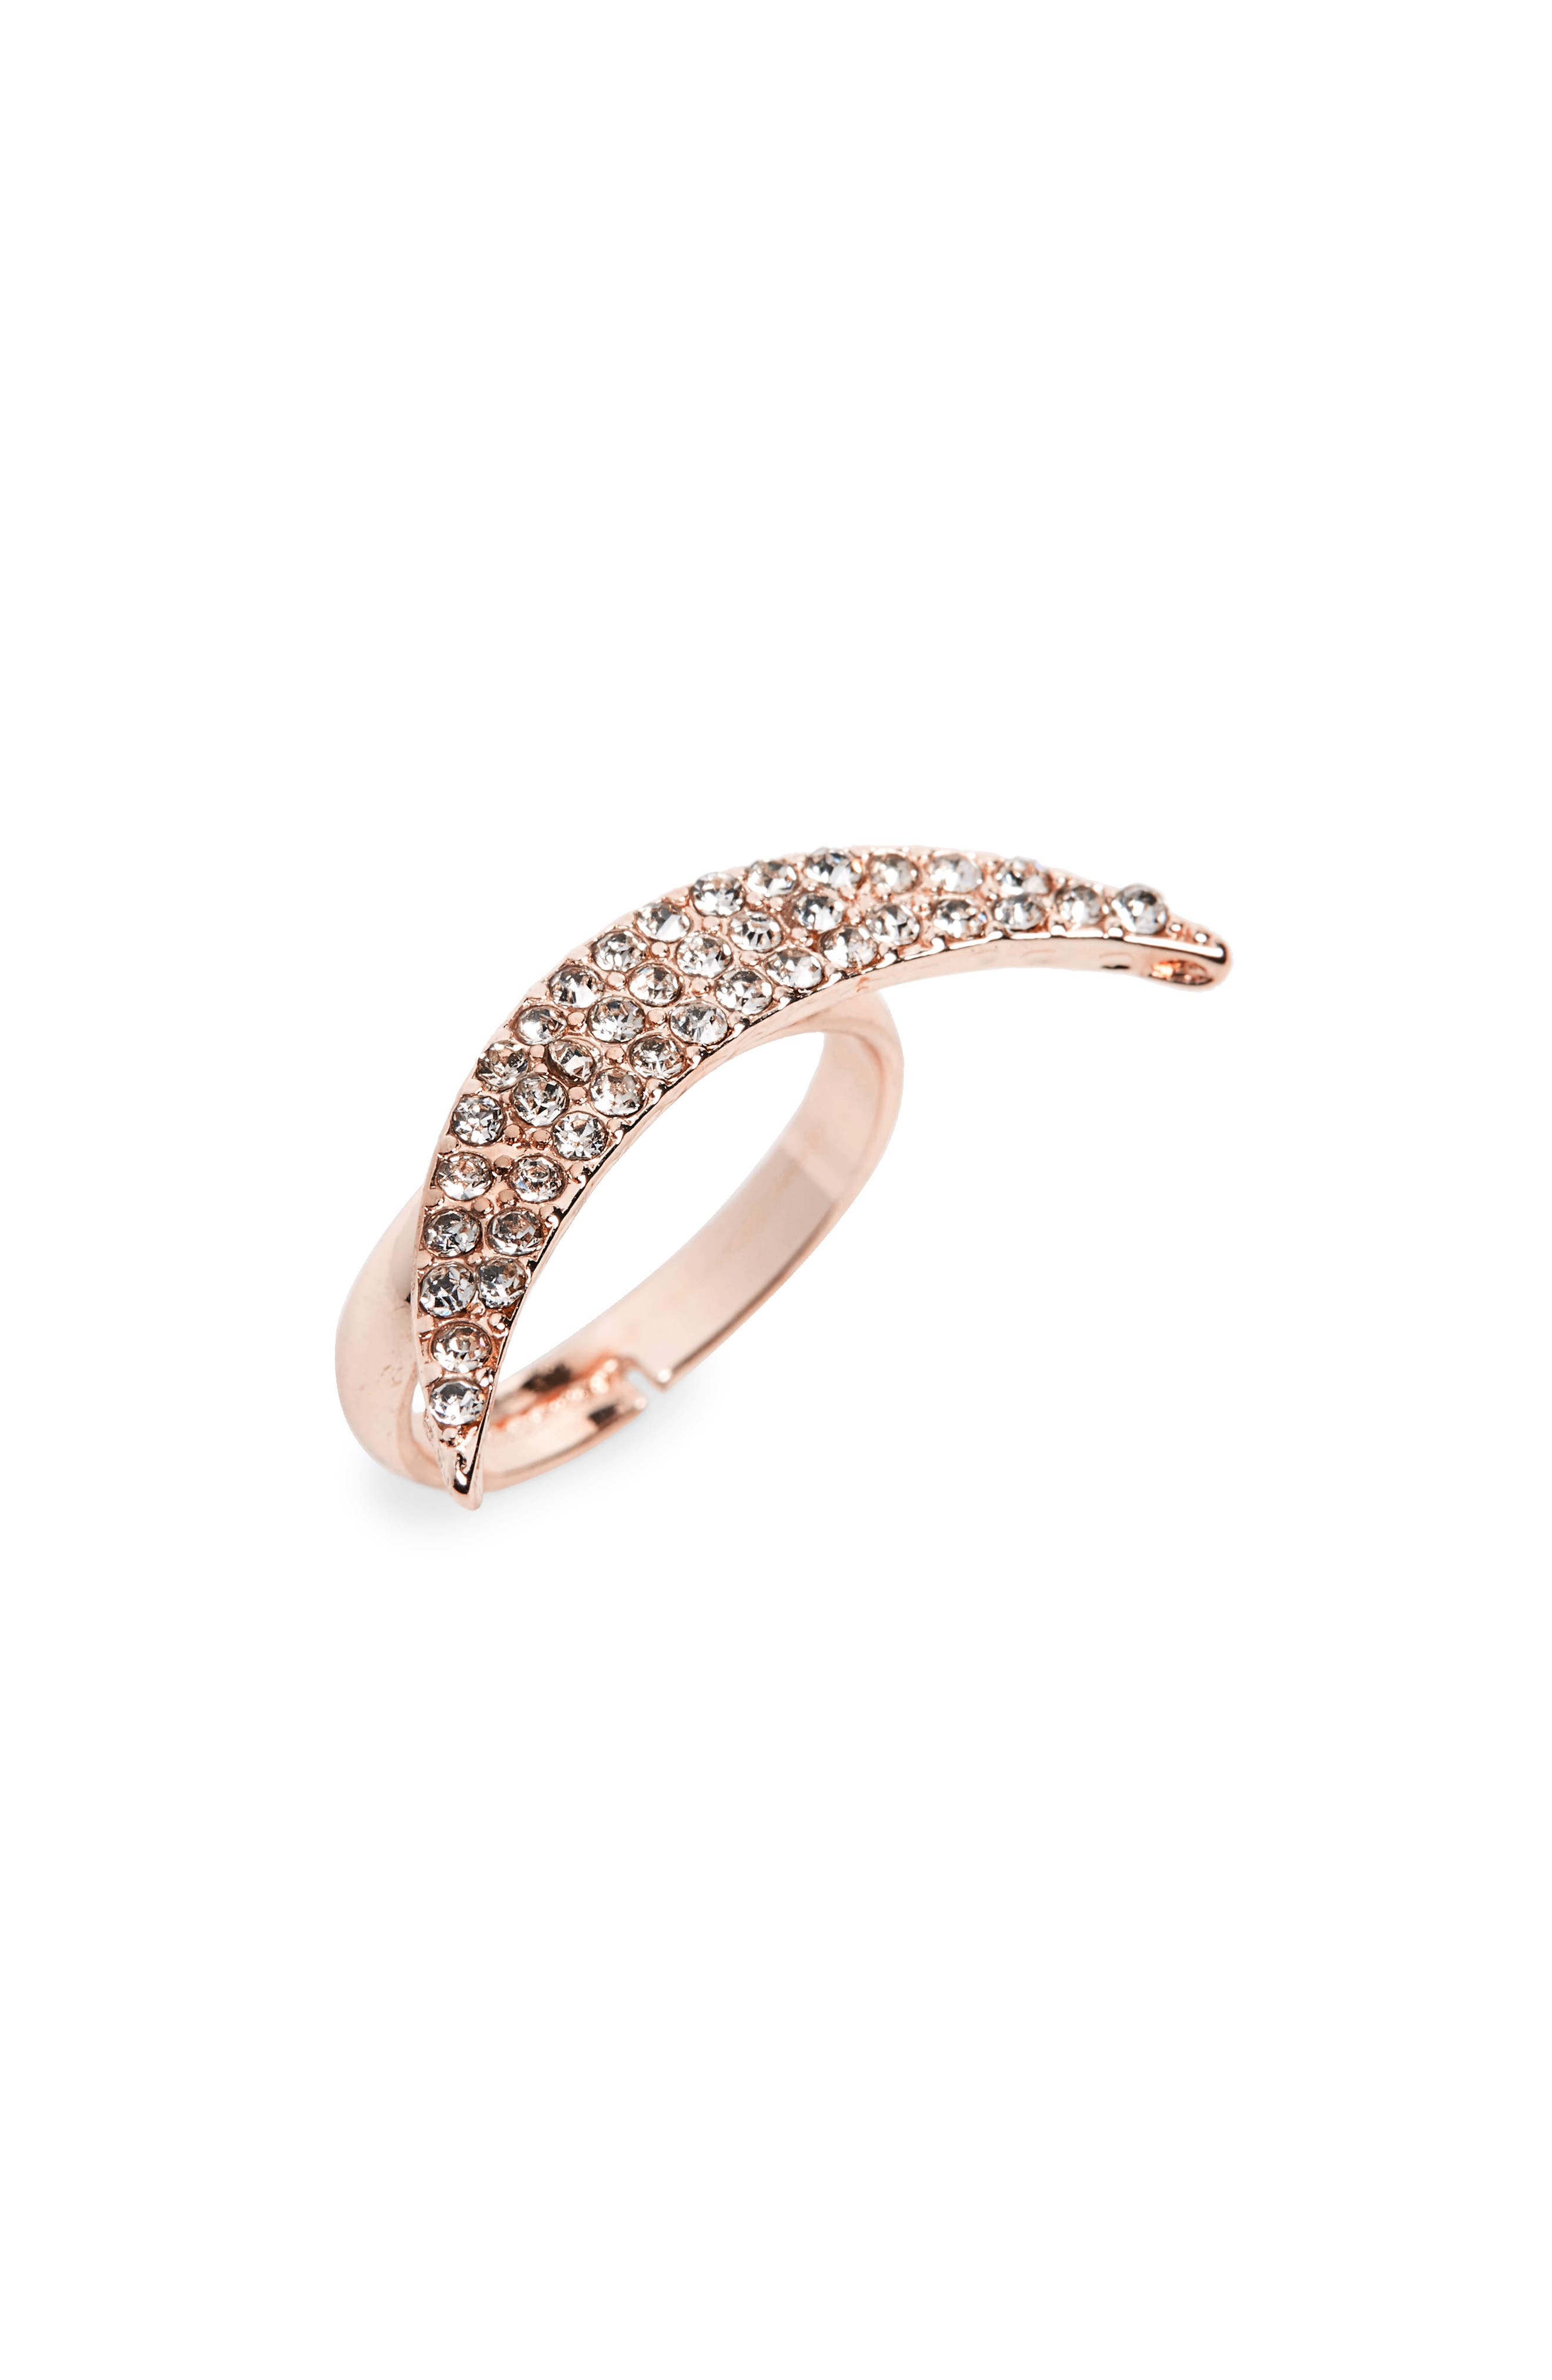 Alternate Image 1 Selected - Natasha Half Moon Crystal Ring